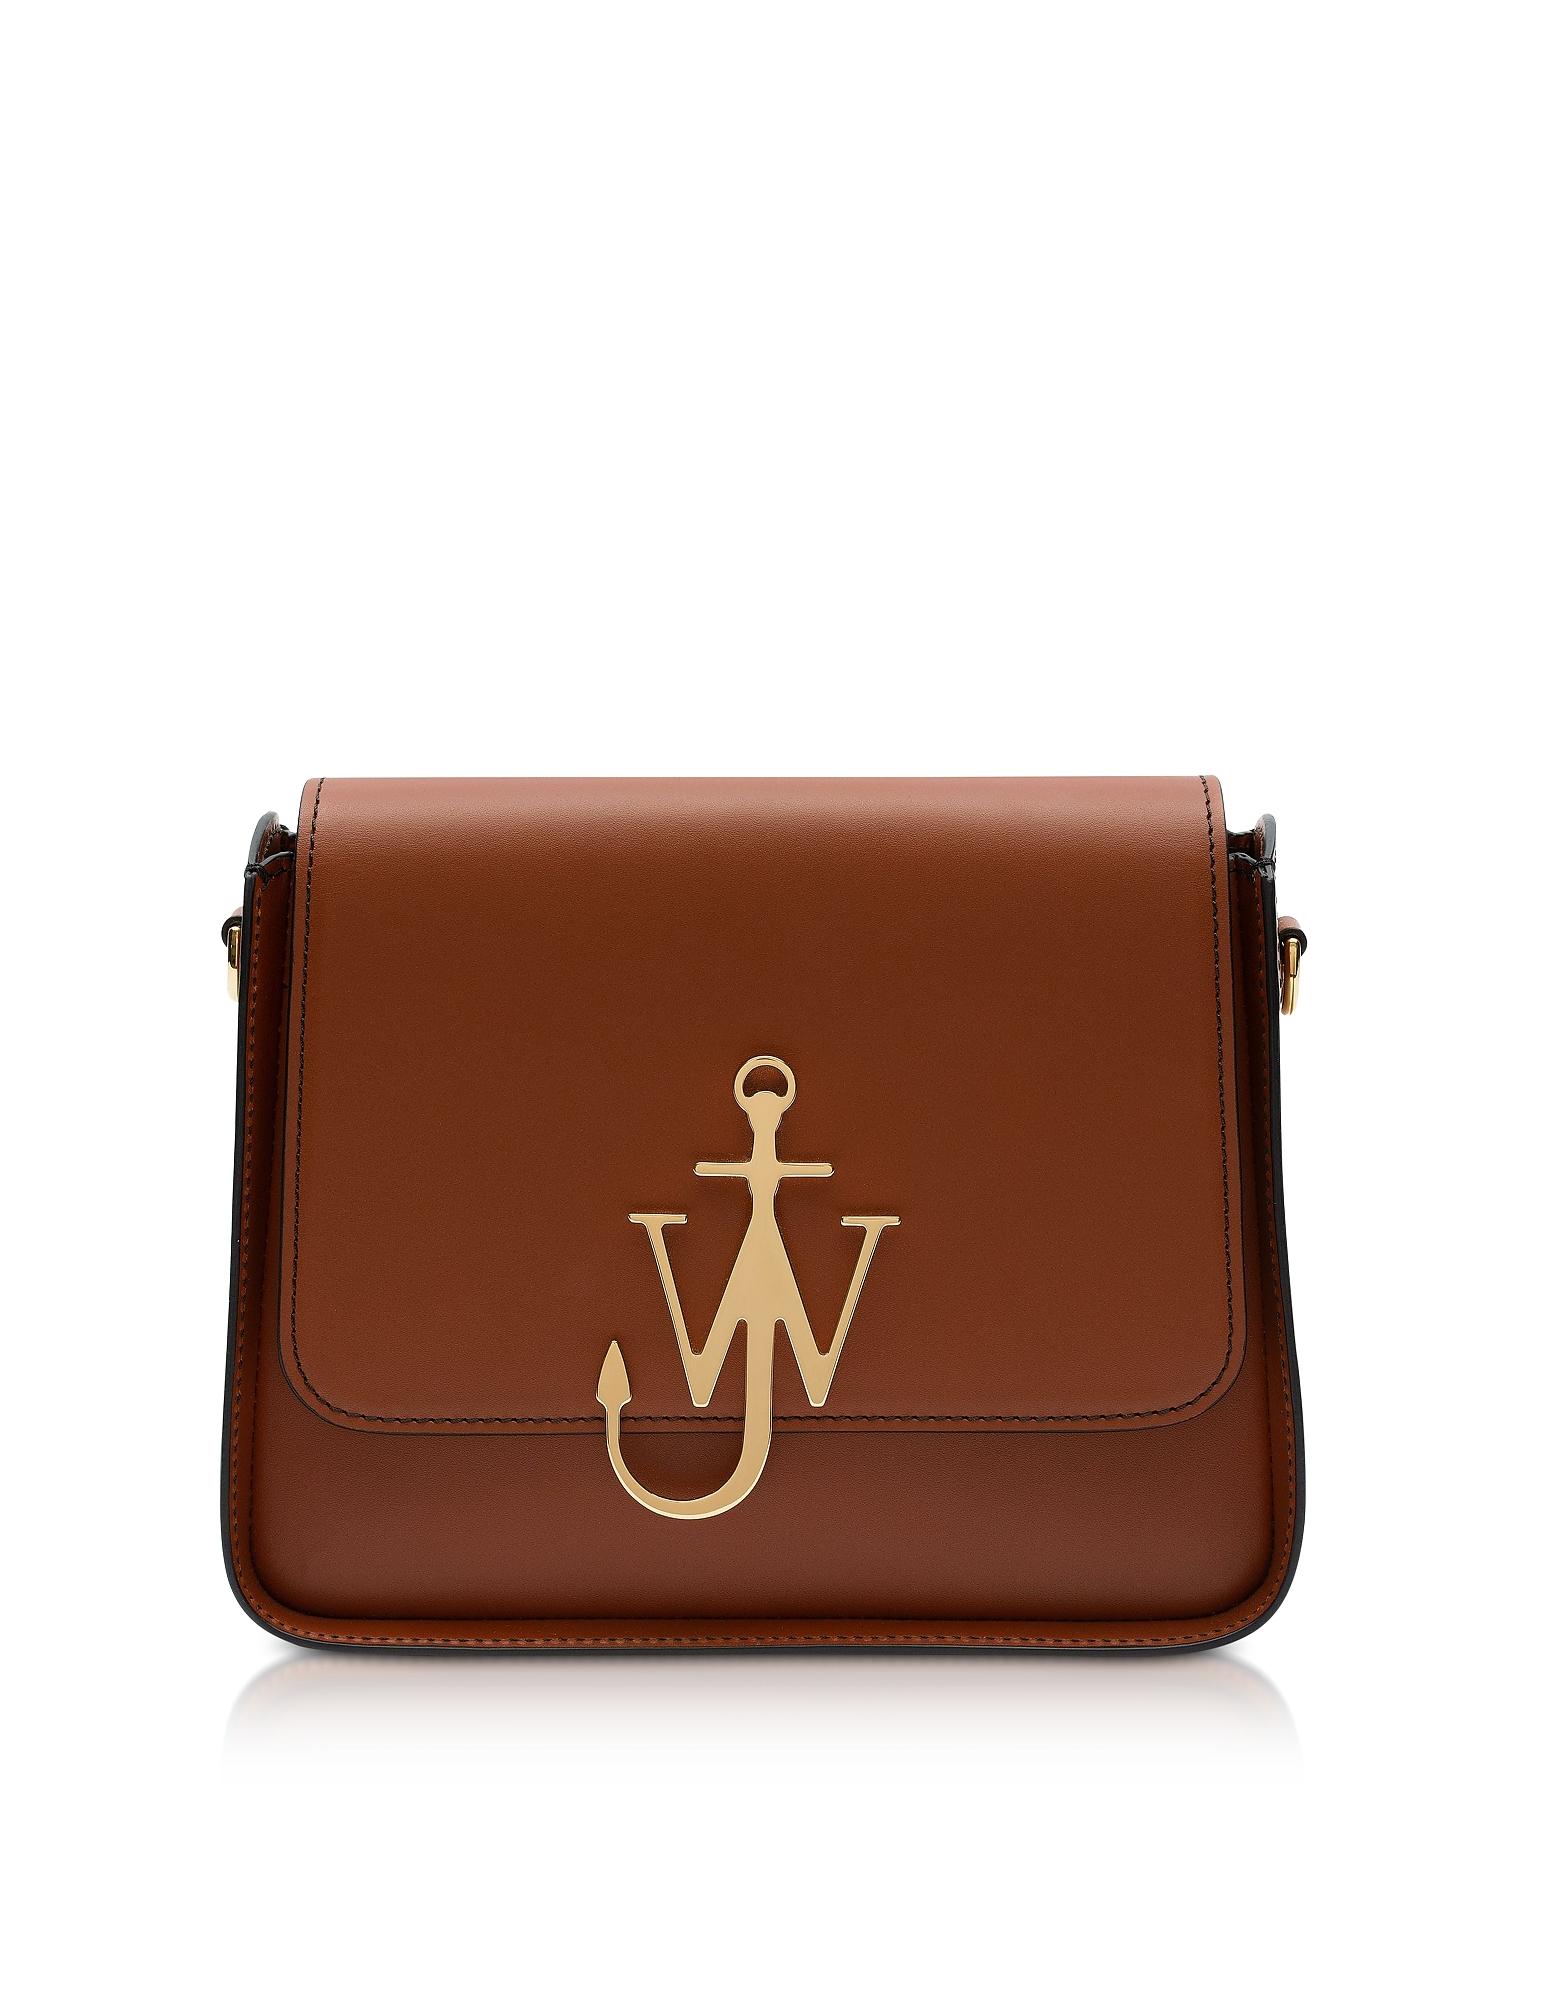 JW Anderson Designer Handbags, Anchor Logo Box Bag